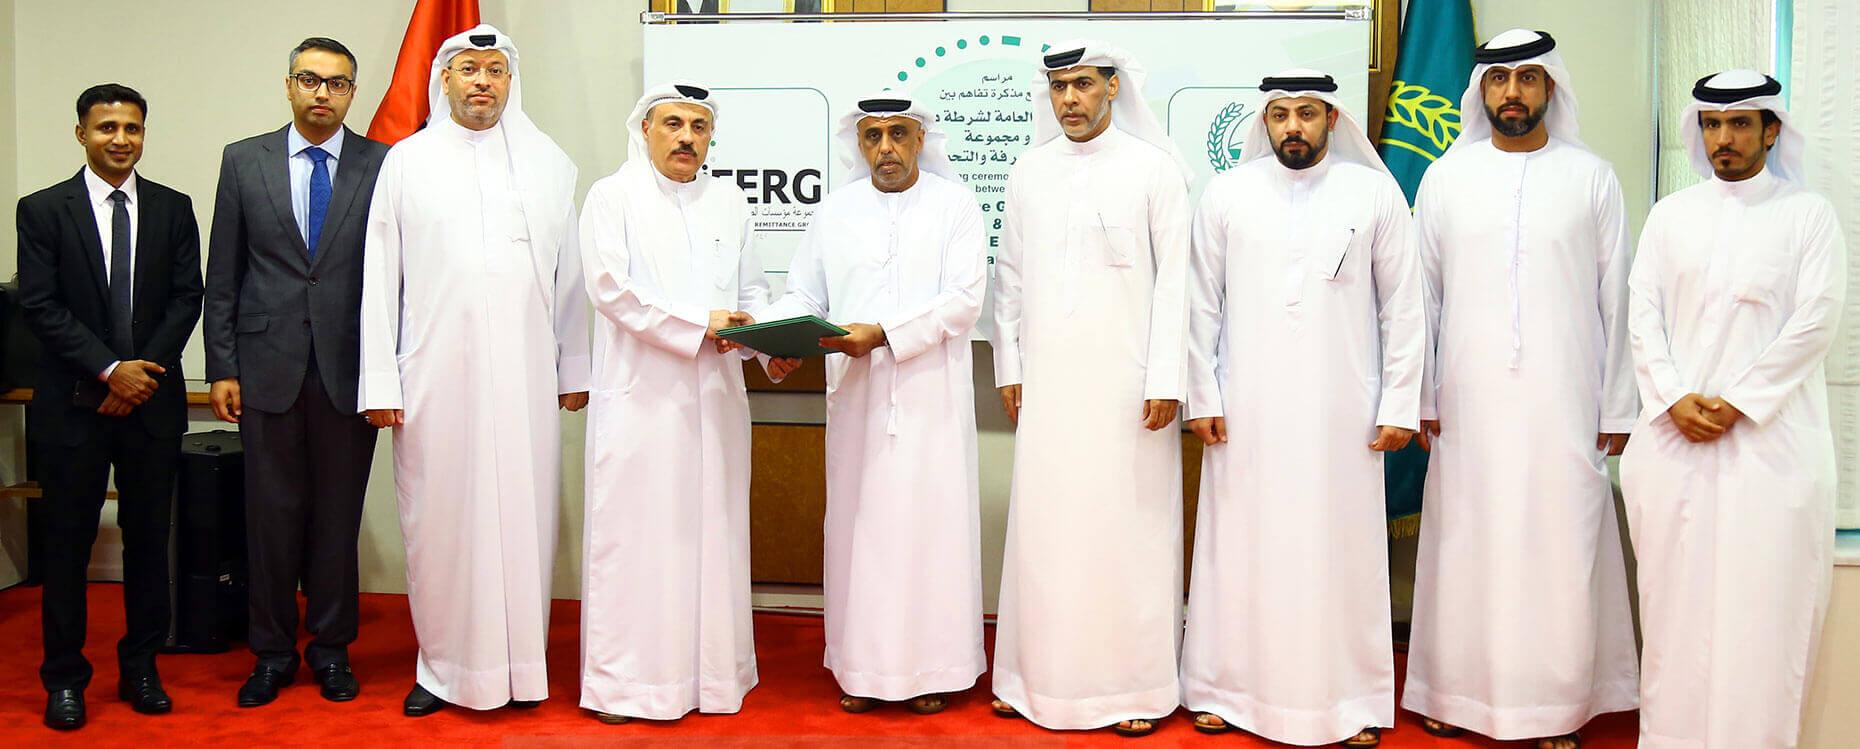 FERG signing ceremony with Dubai Police